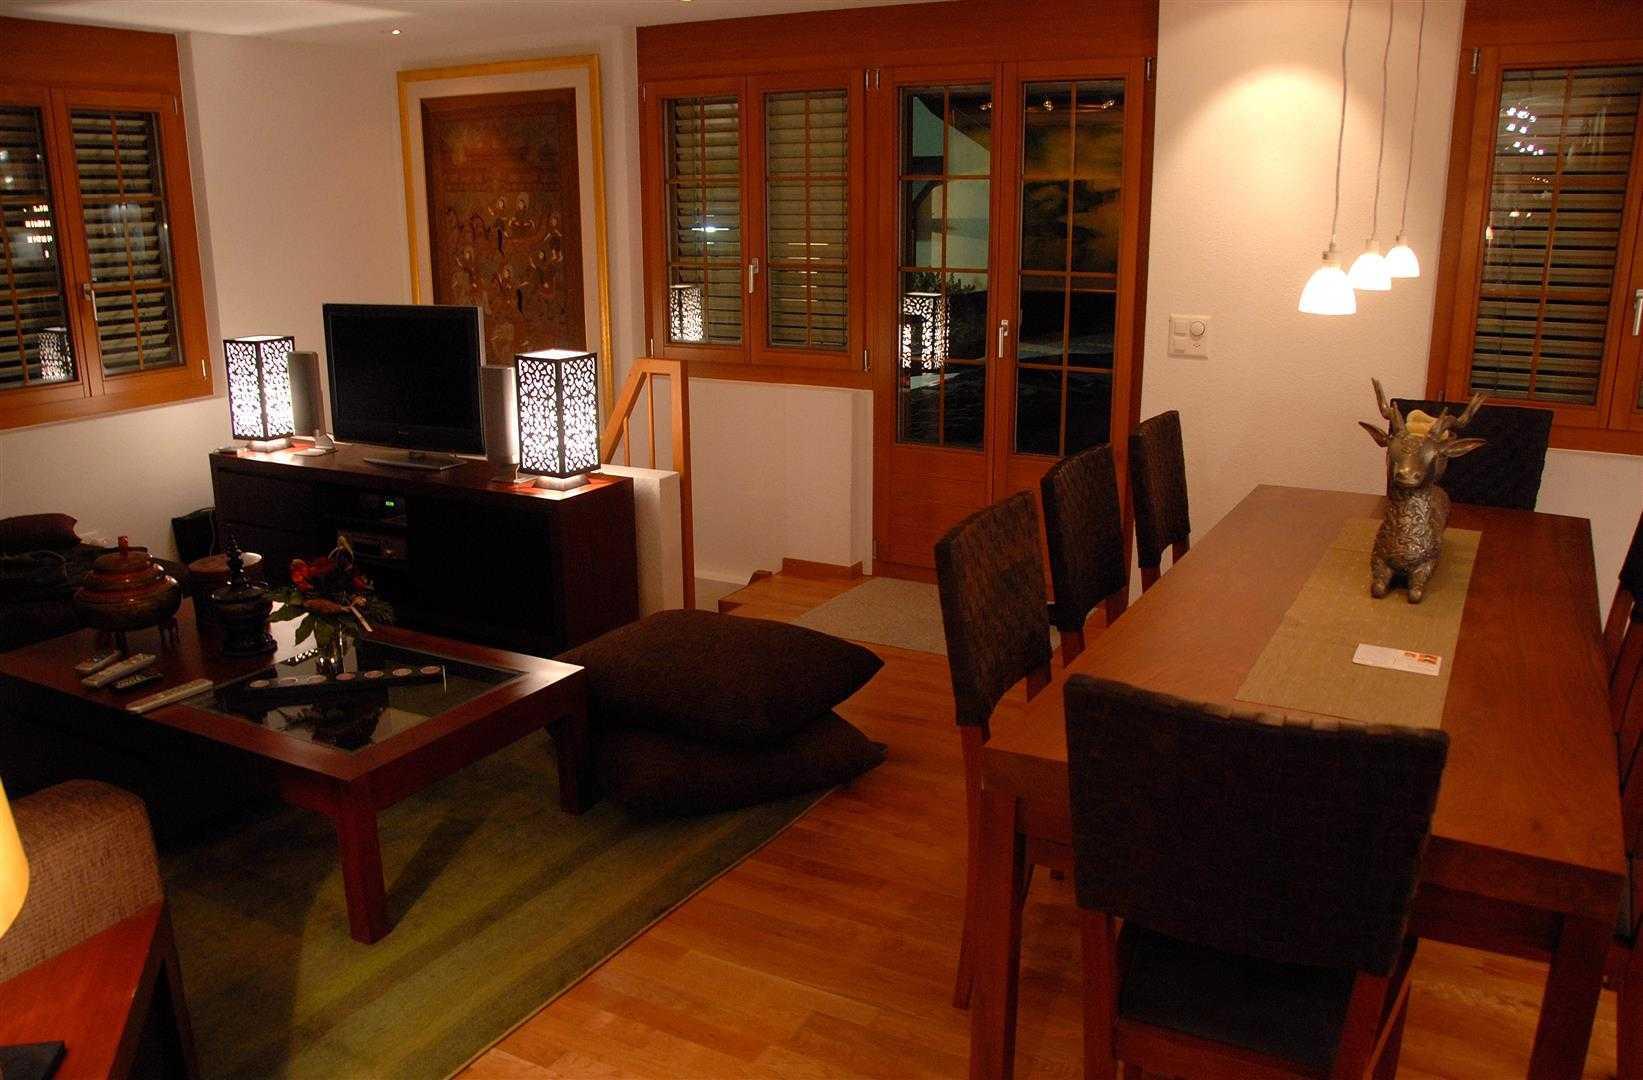 Agung Budi Raharsa Lenk Hotel - Switzerland Switzerland Switzerland Living-Dining Minimalis  12756